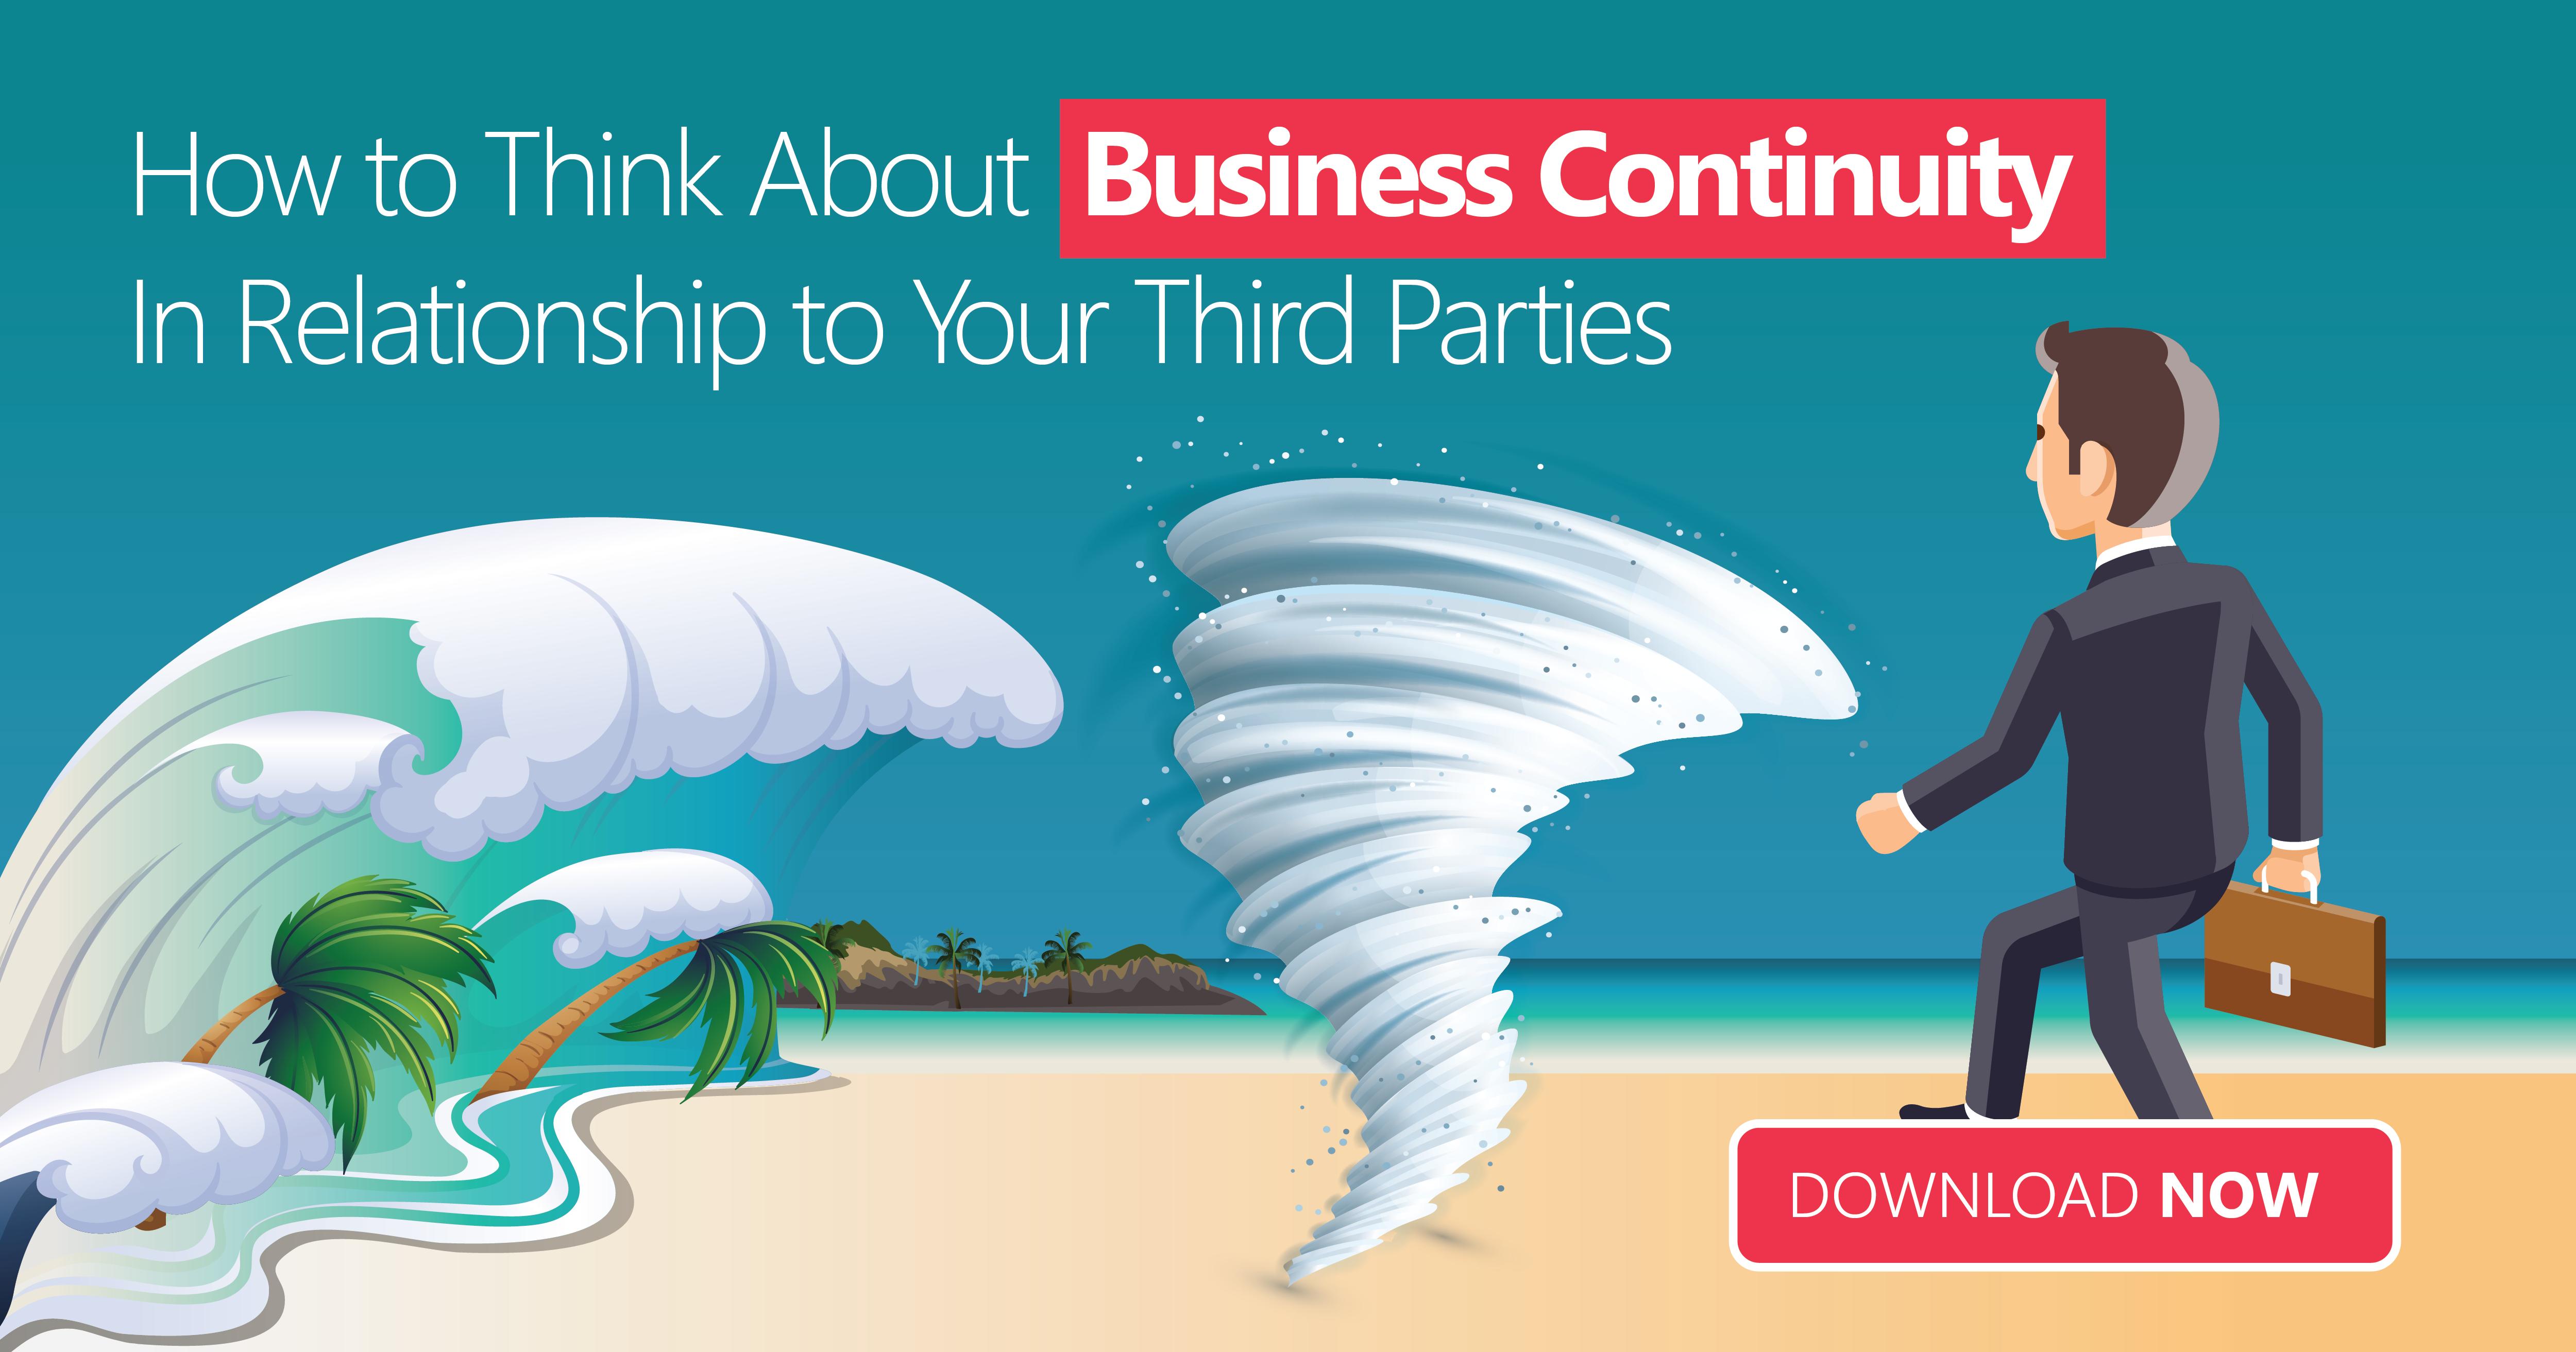 Vendor Business Continuity for Third Parties